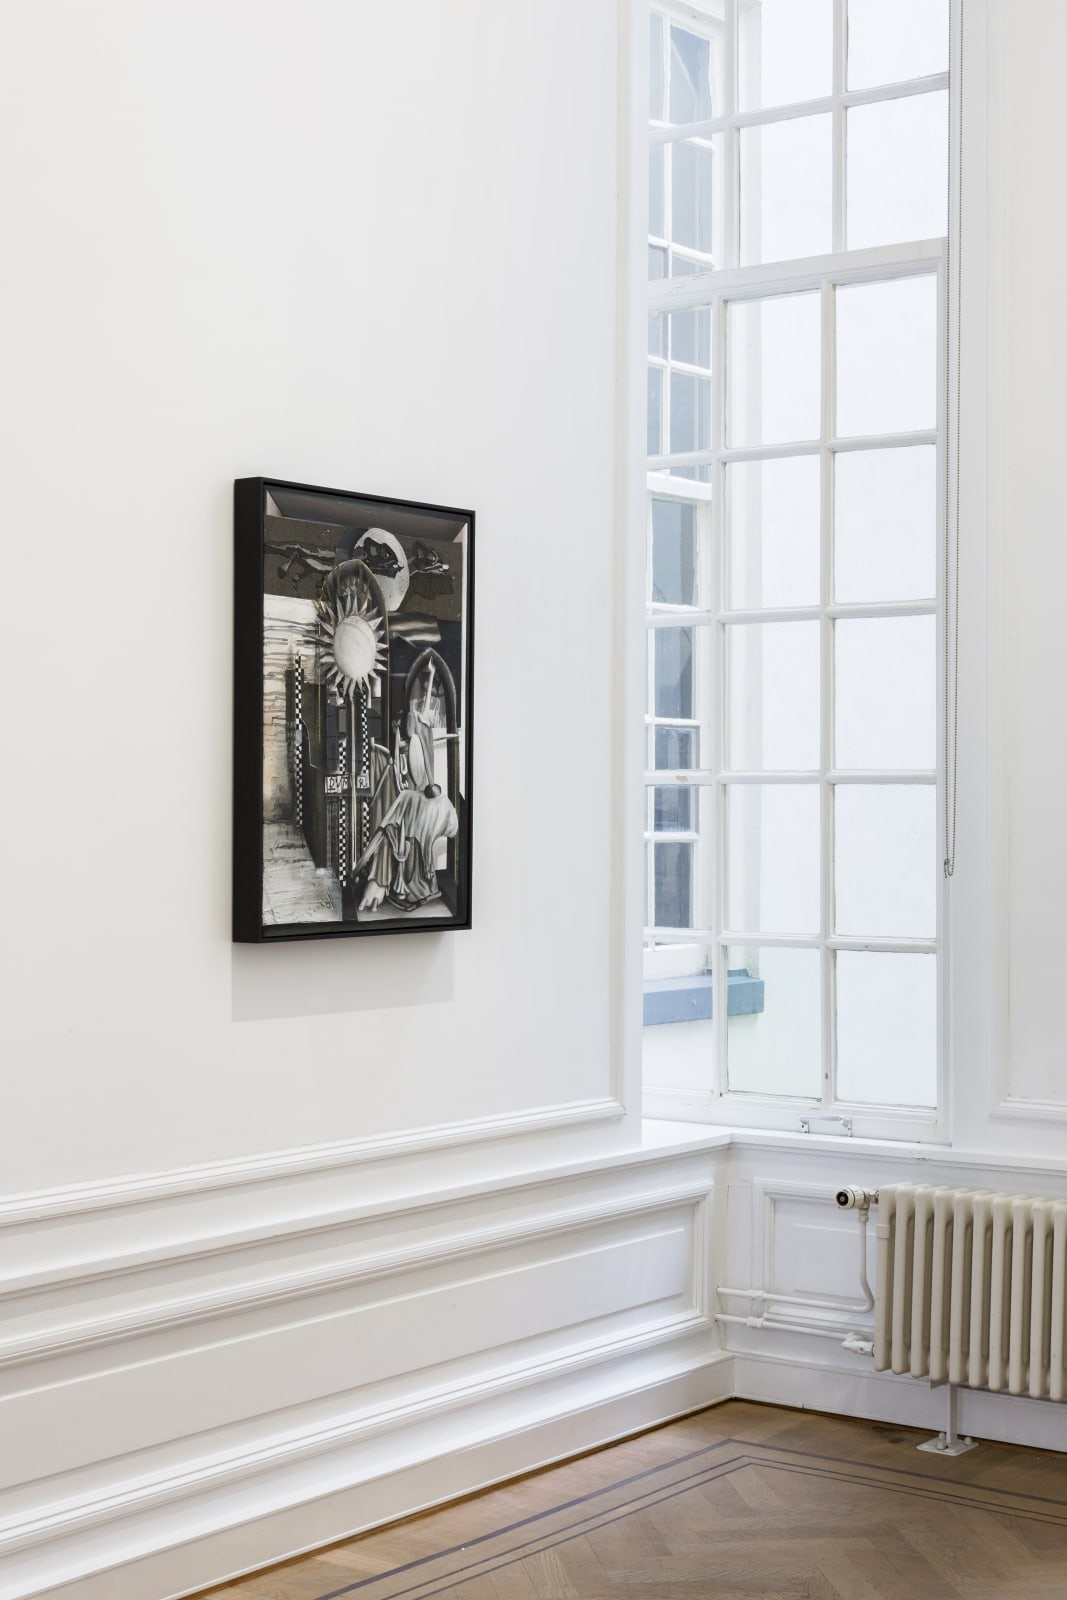 Installation view | Symbiosis: Virtues | GRIMM, Amsterdam (NL), 2021